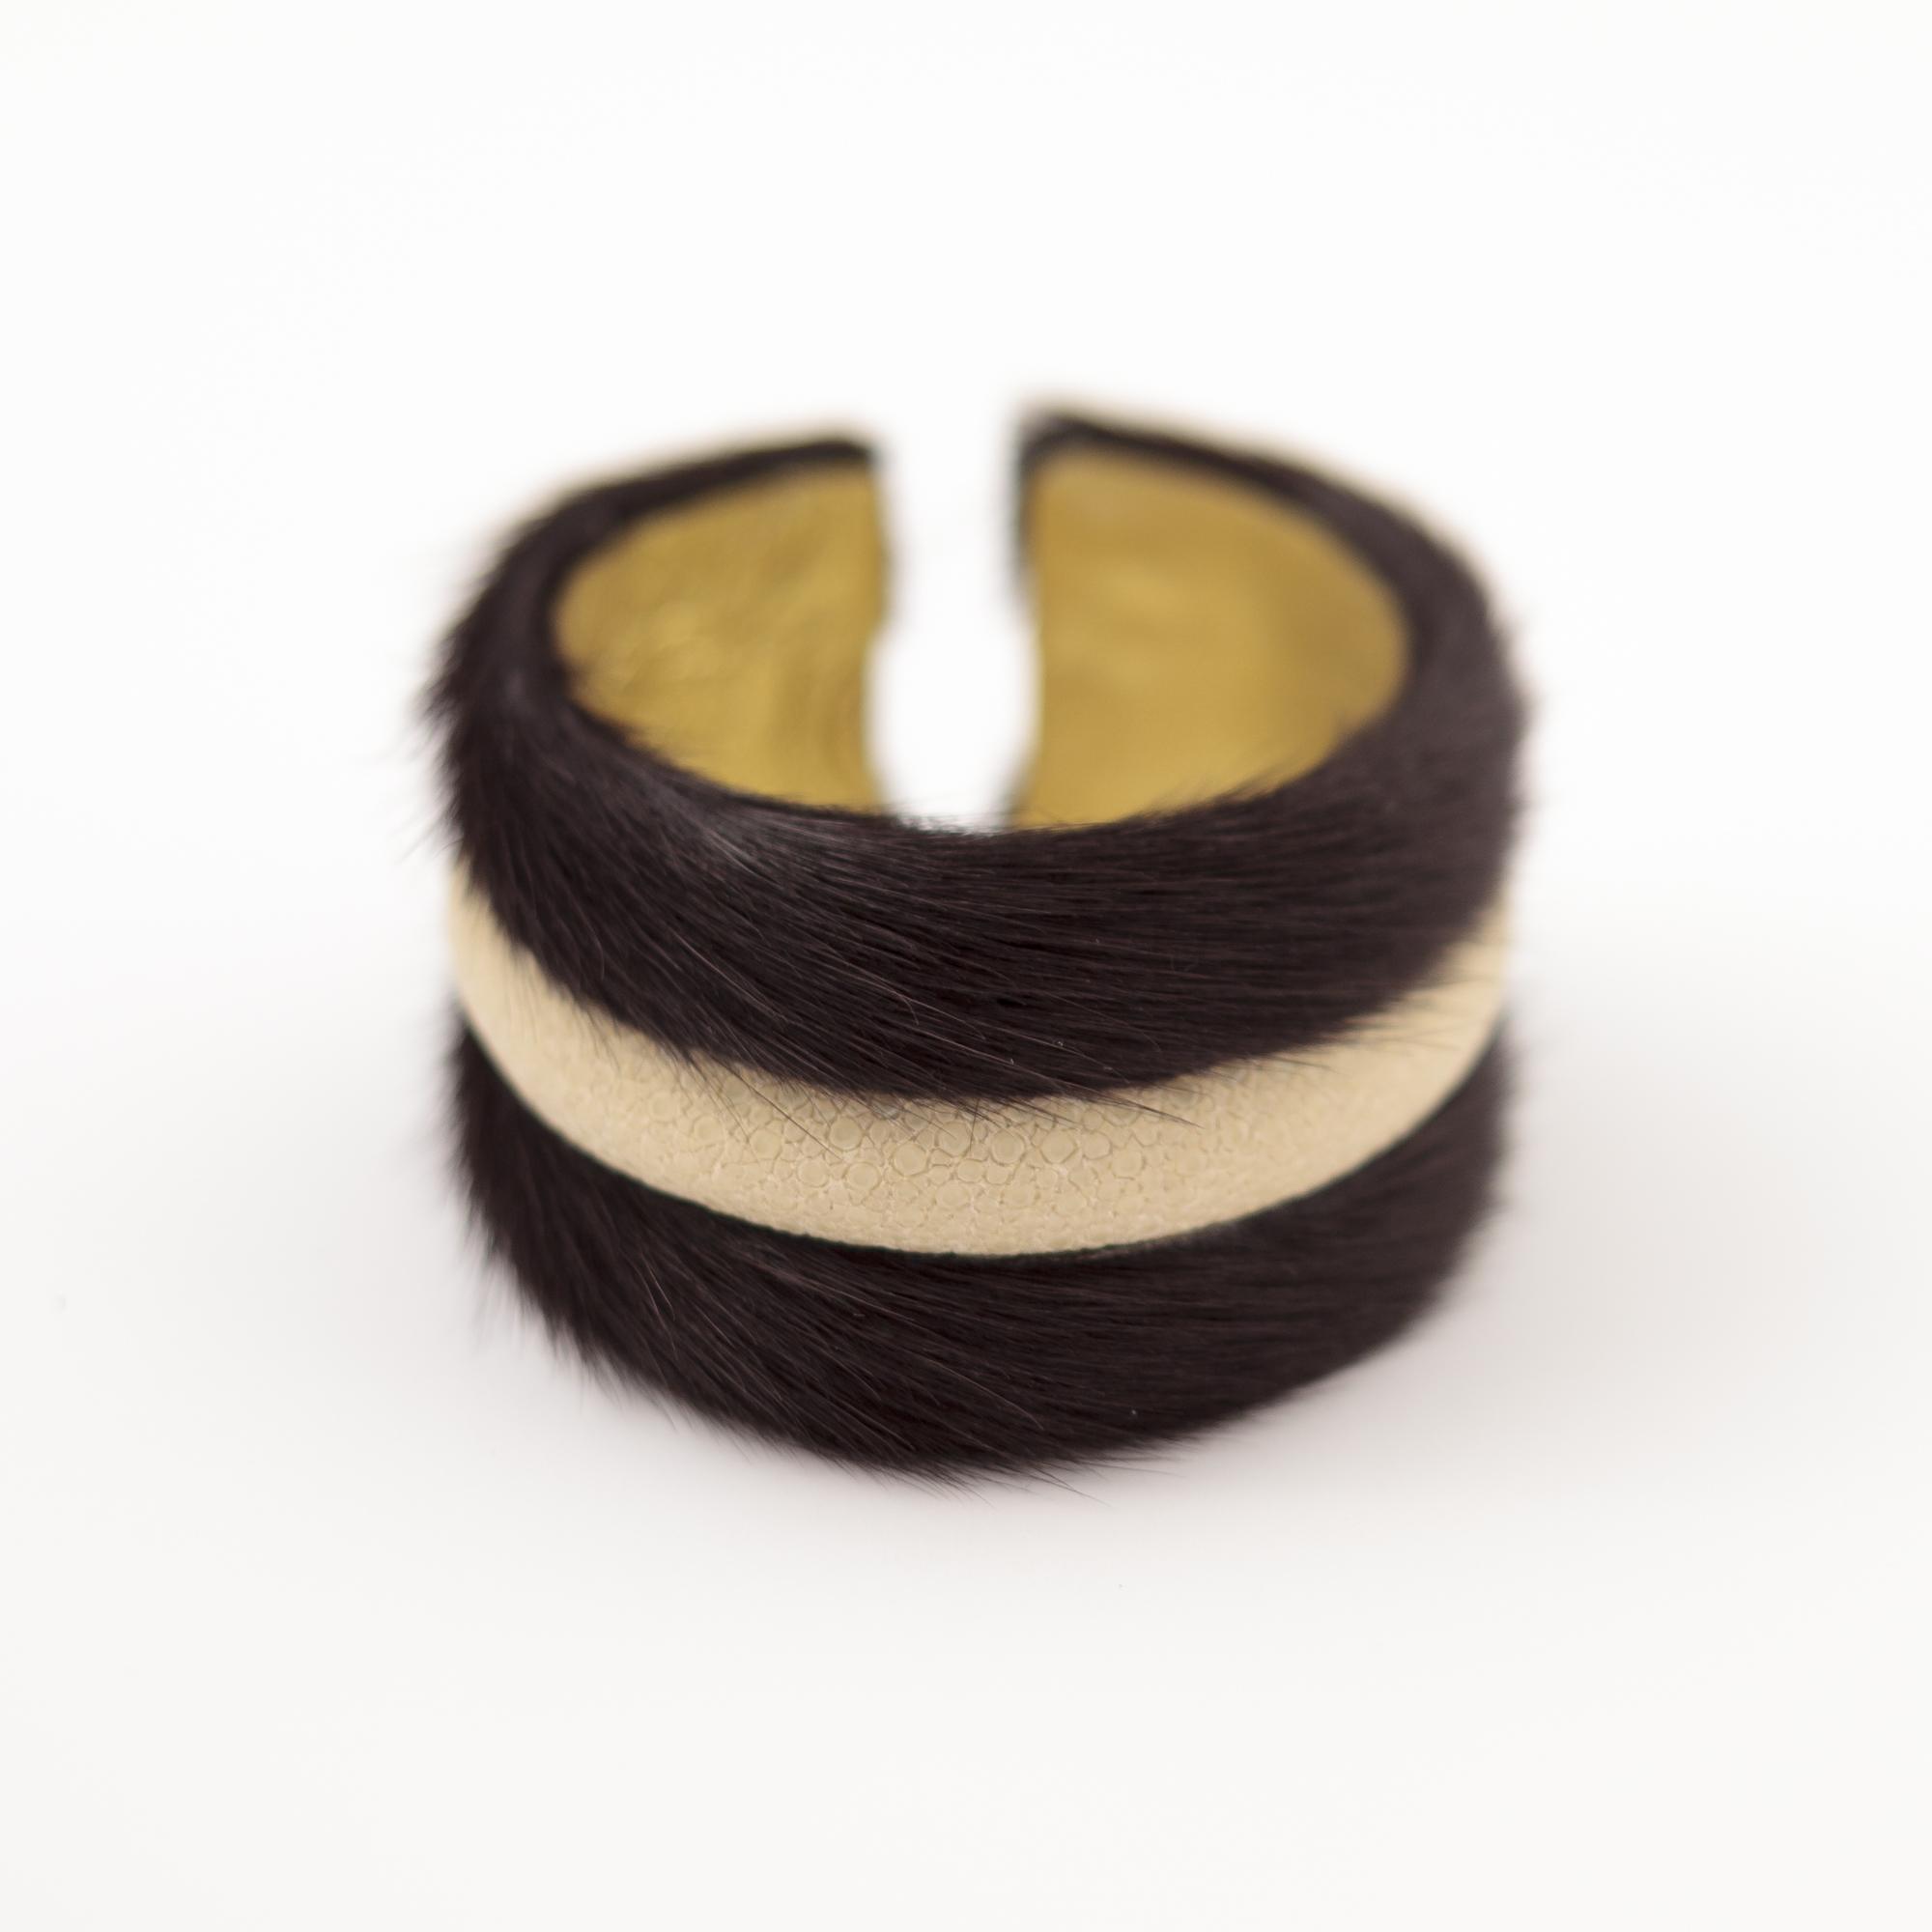 tresor-by-flore-galuchat-bracelet-poilu-brun-naturel